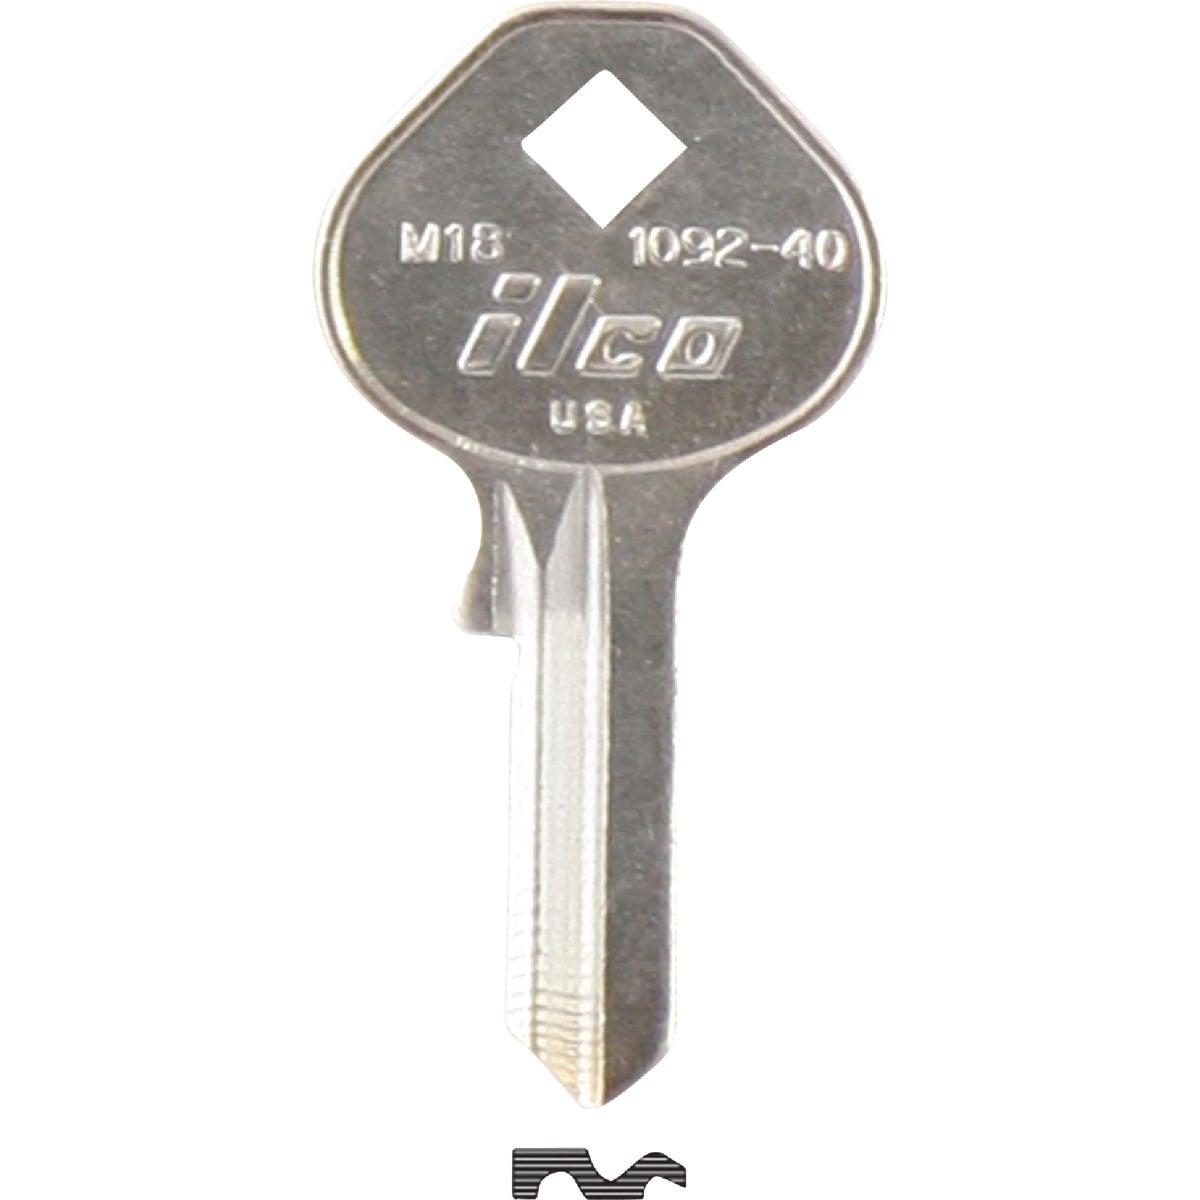 M18 MASTER PADLOCK KEY - 1092-40 by Ilco Corp